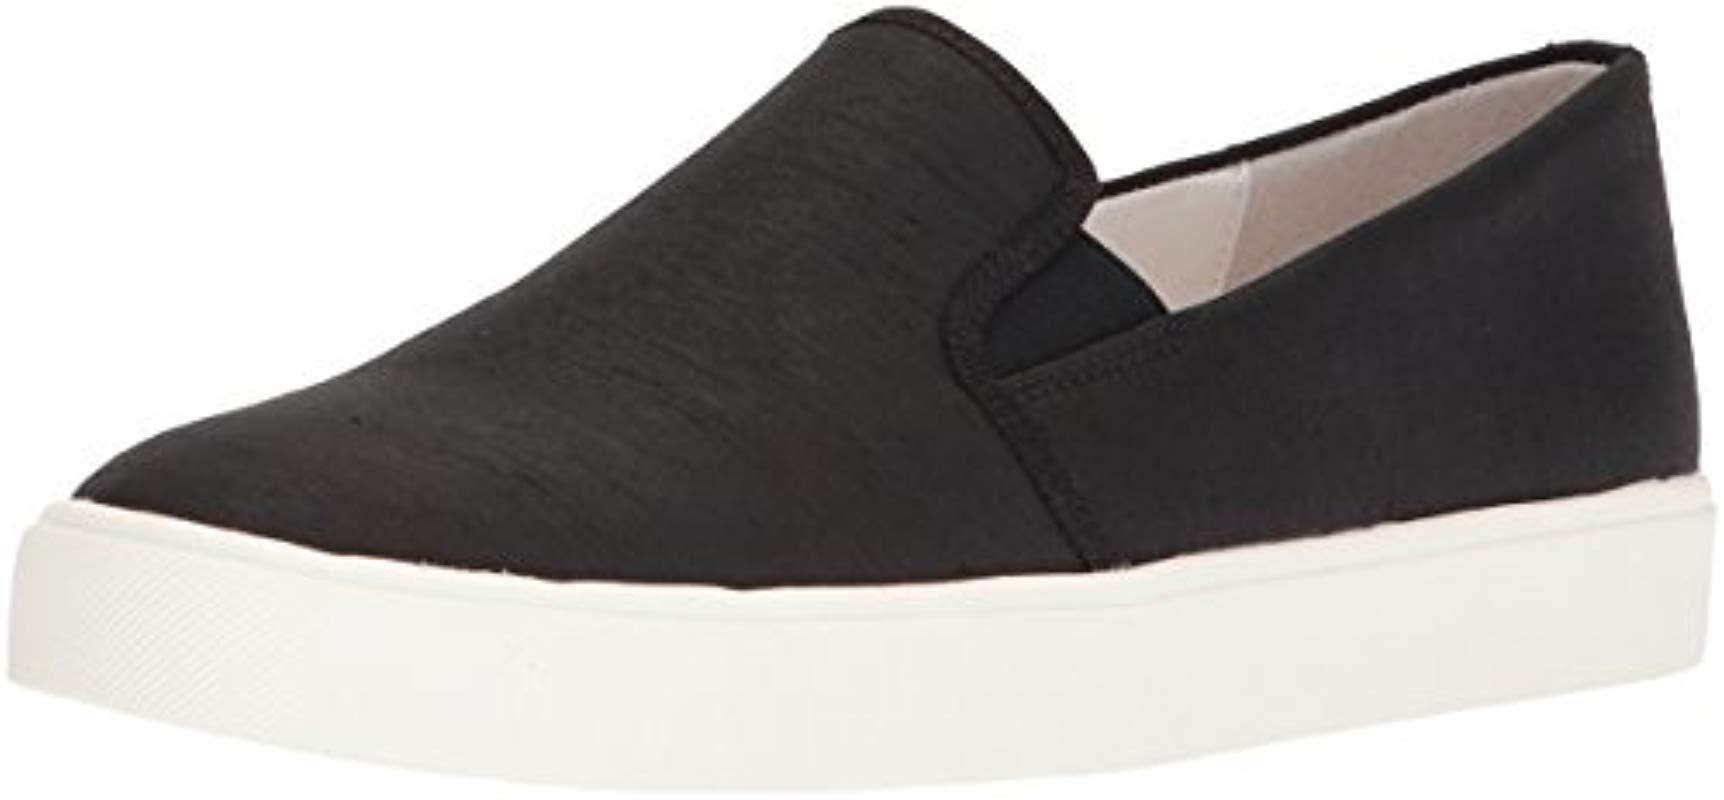 d29603240 Lyst - Sam Edelman Elton Sneaker in Black - Save 50%